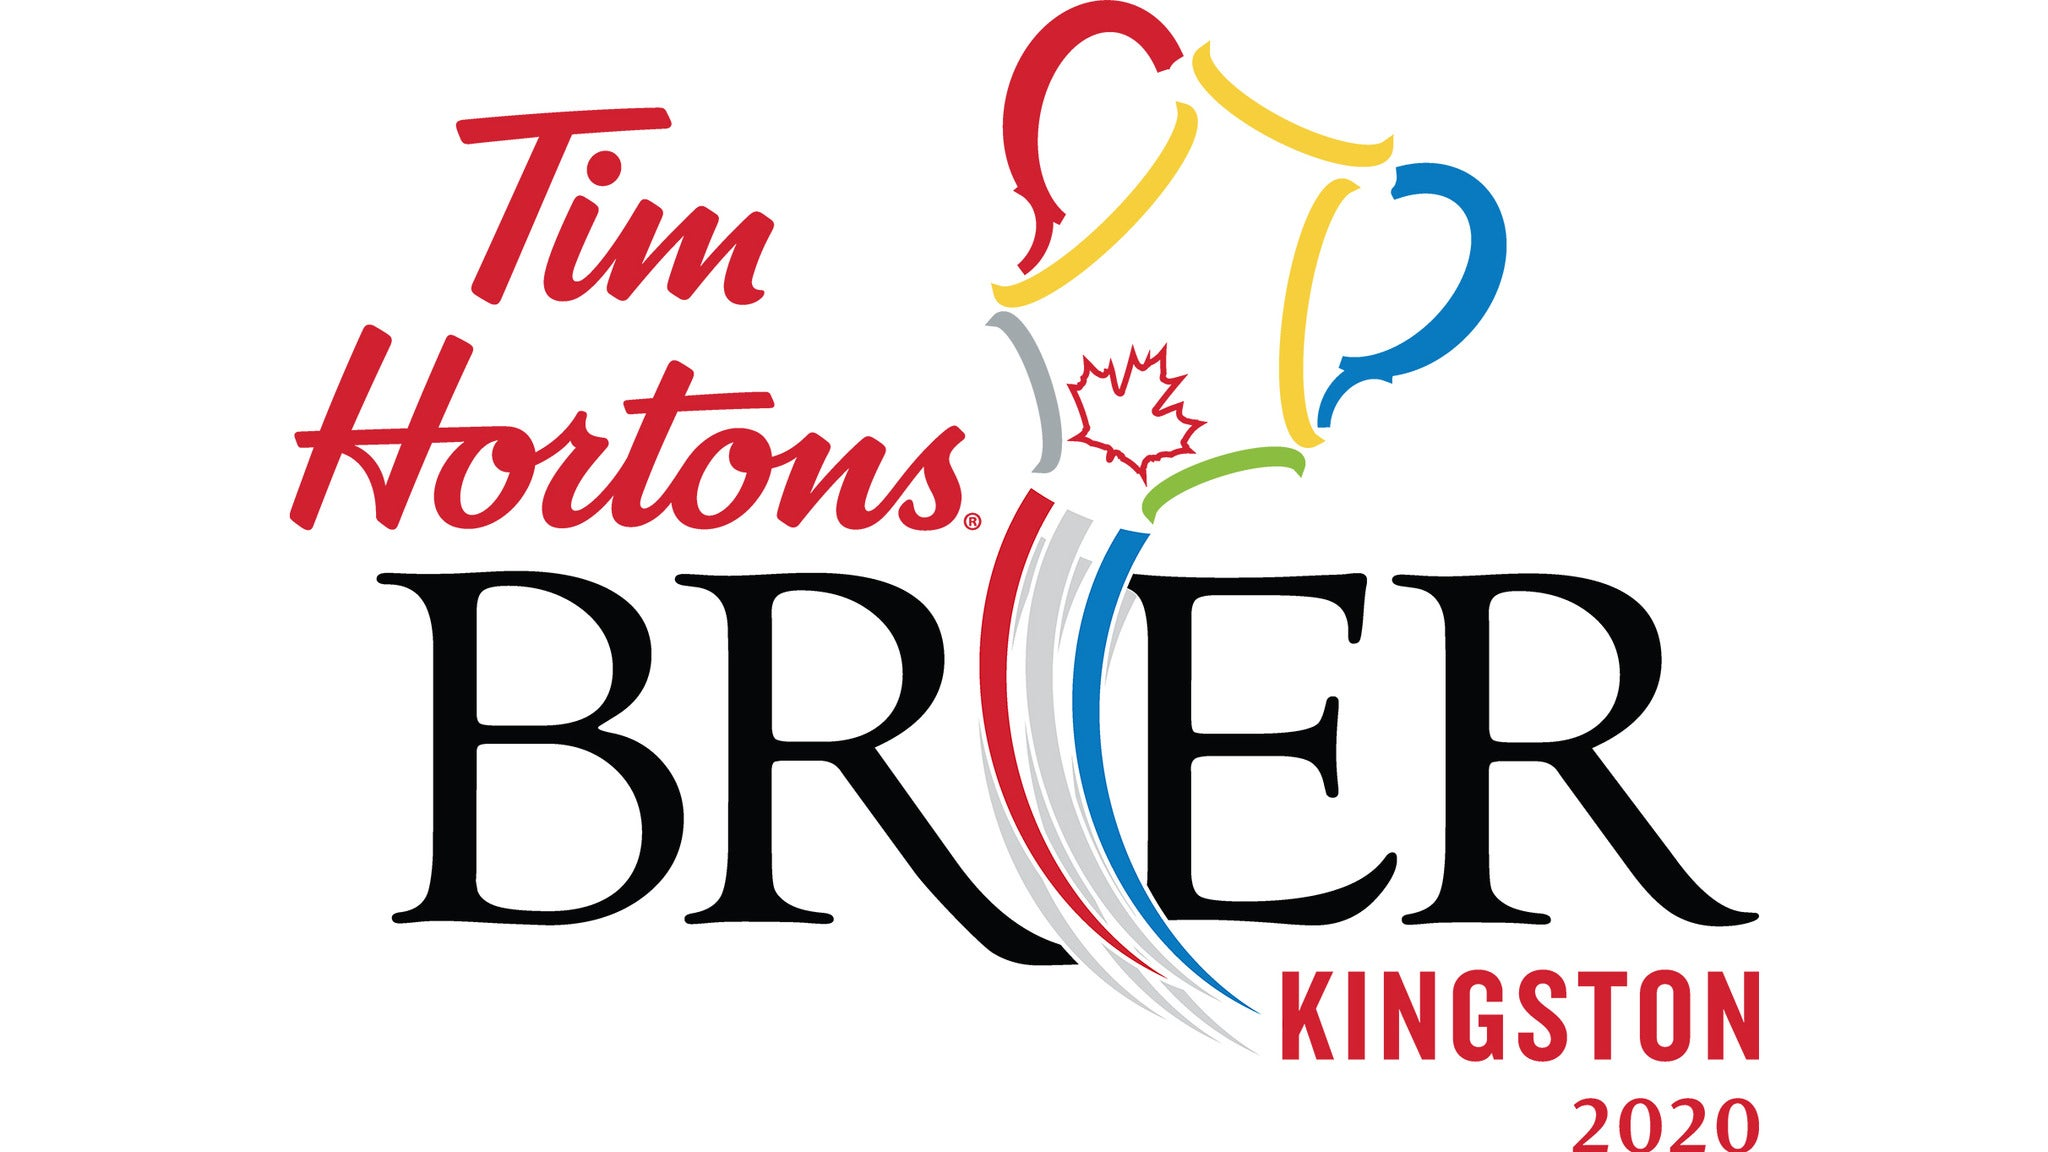 220 Tim Hortons brier